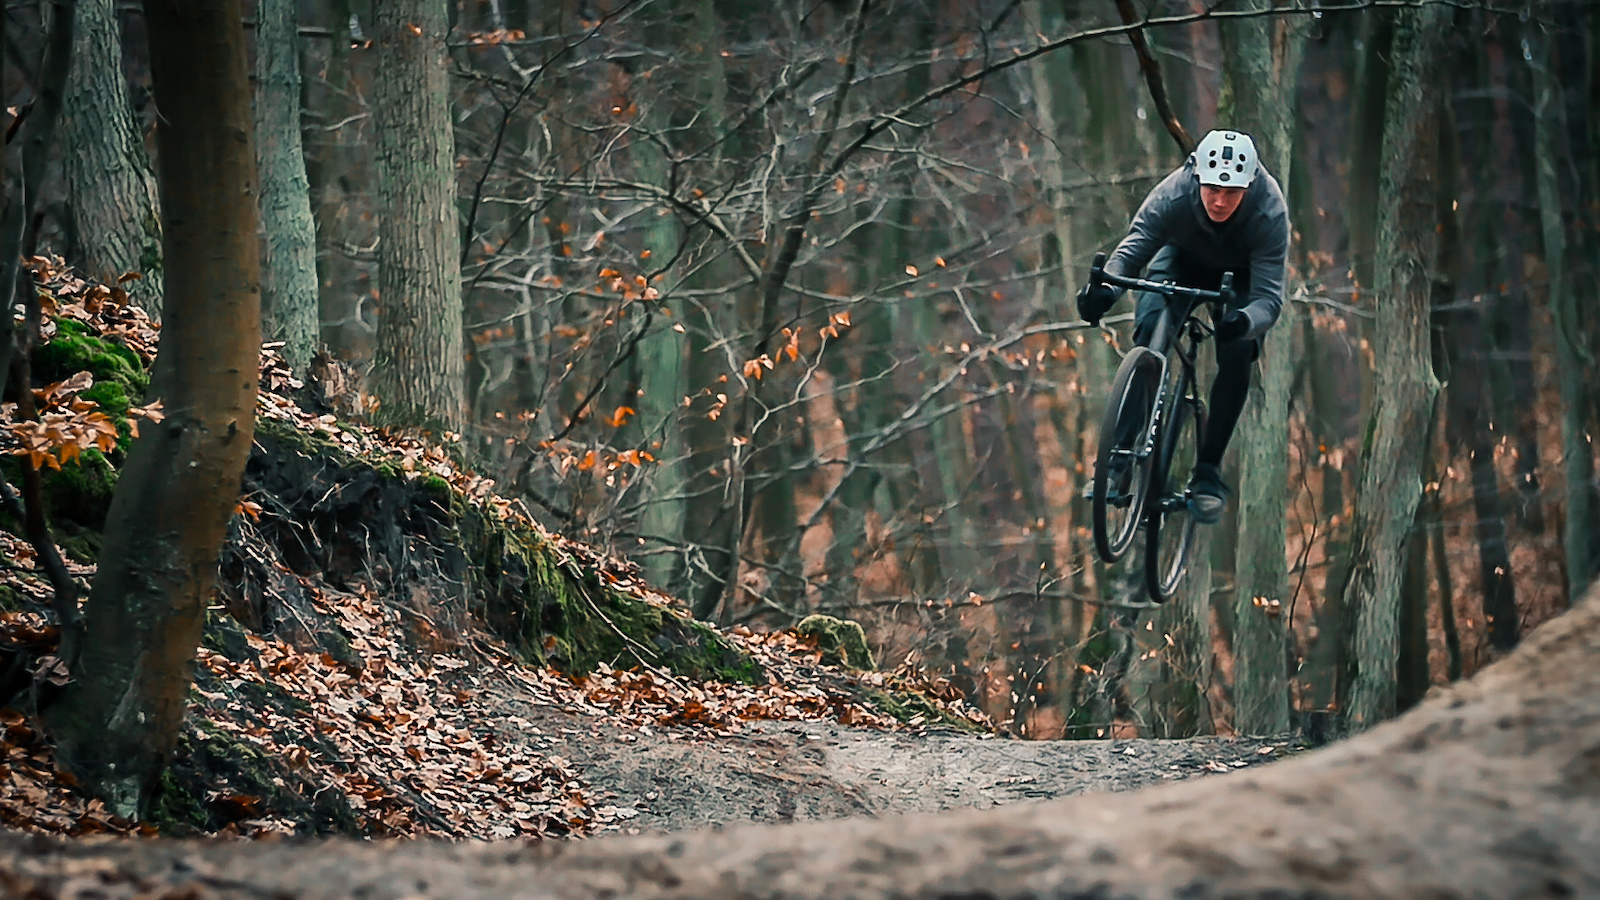 ea2c13ddd3 Mountain Biking News Archive - Pinkbike